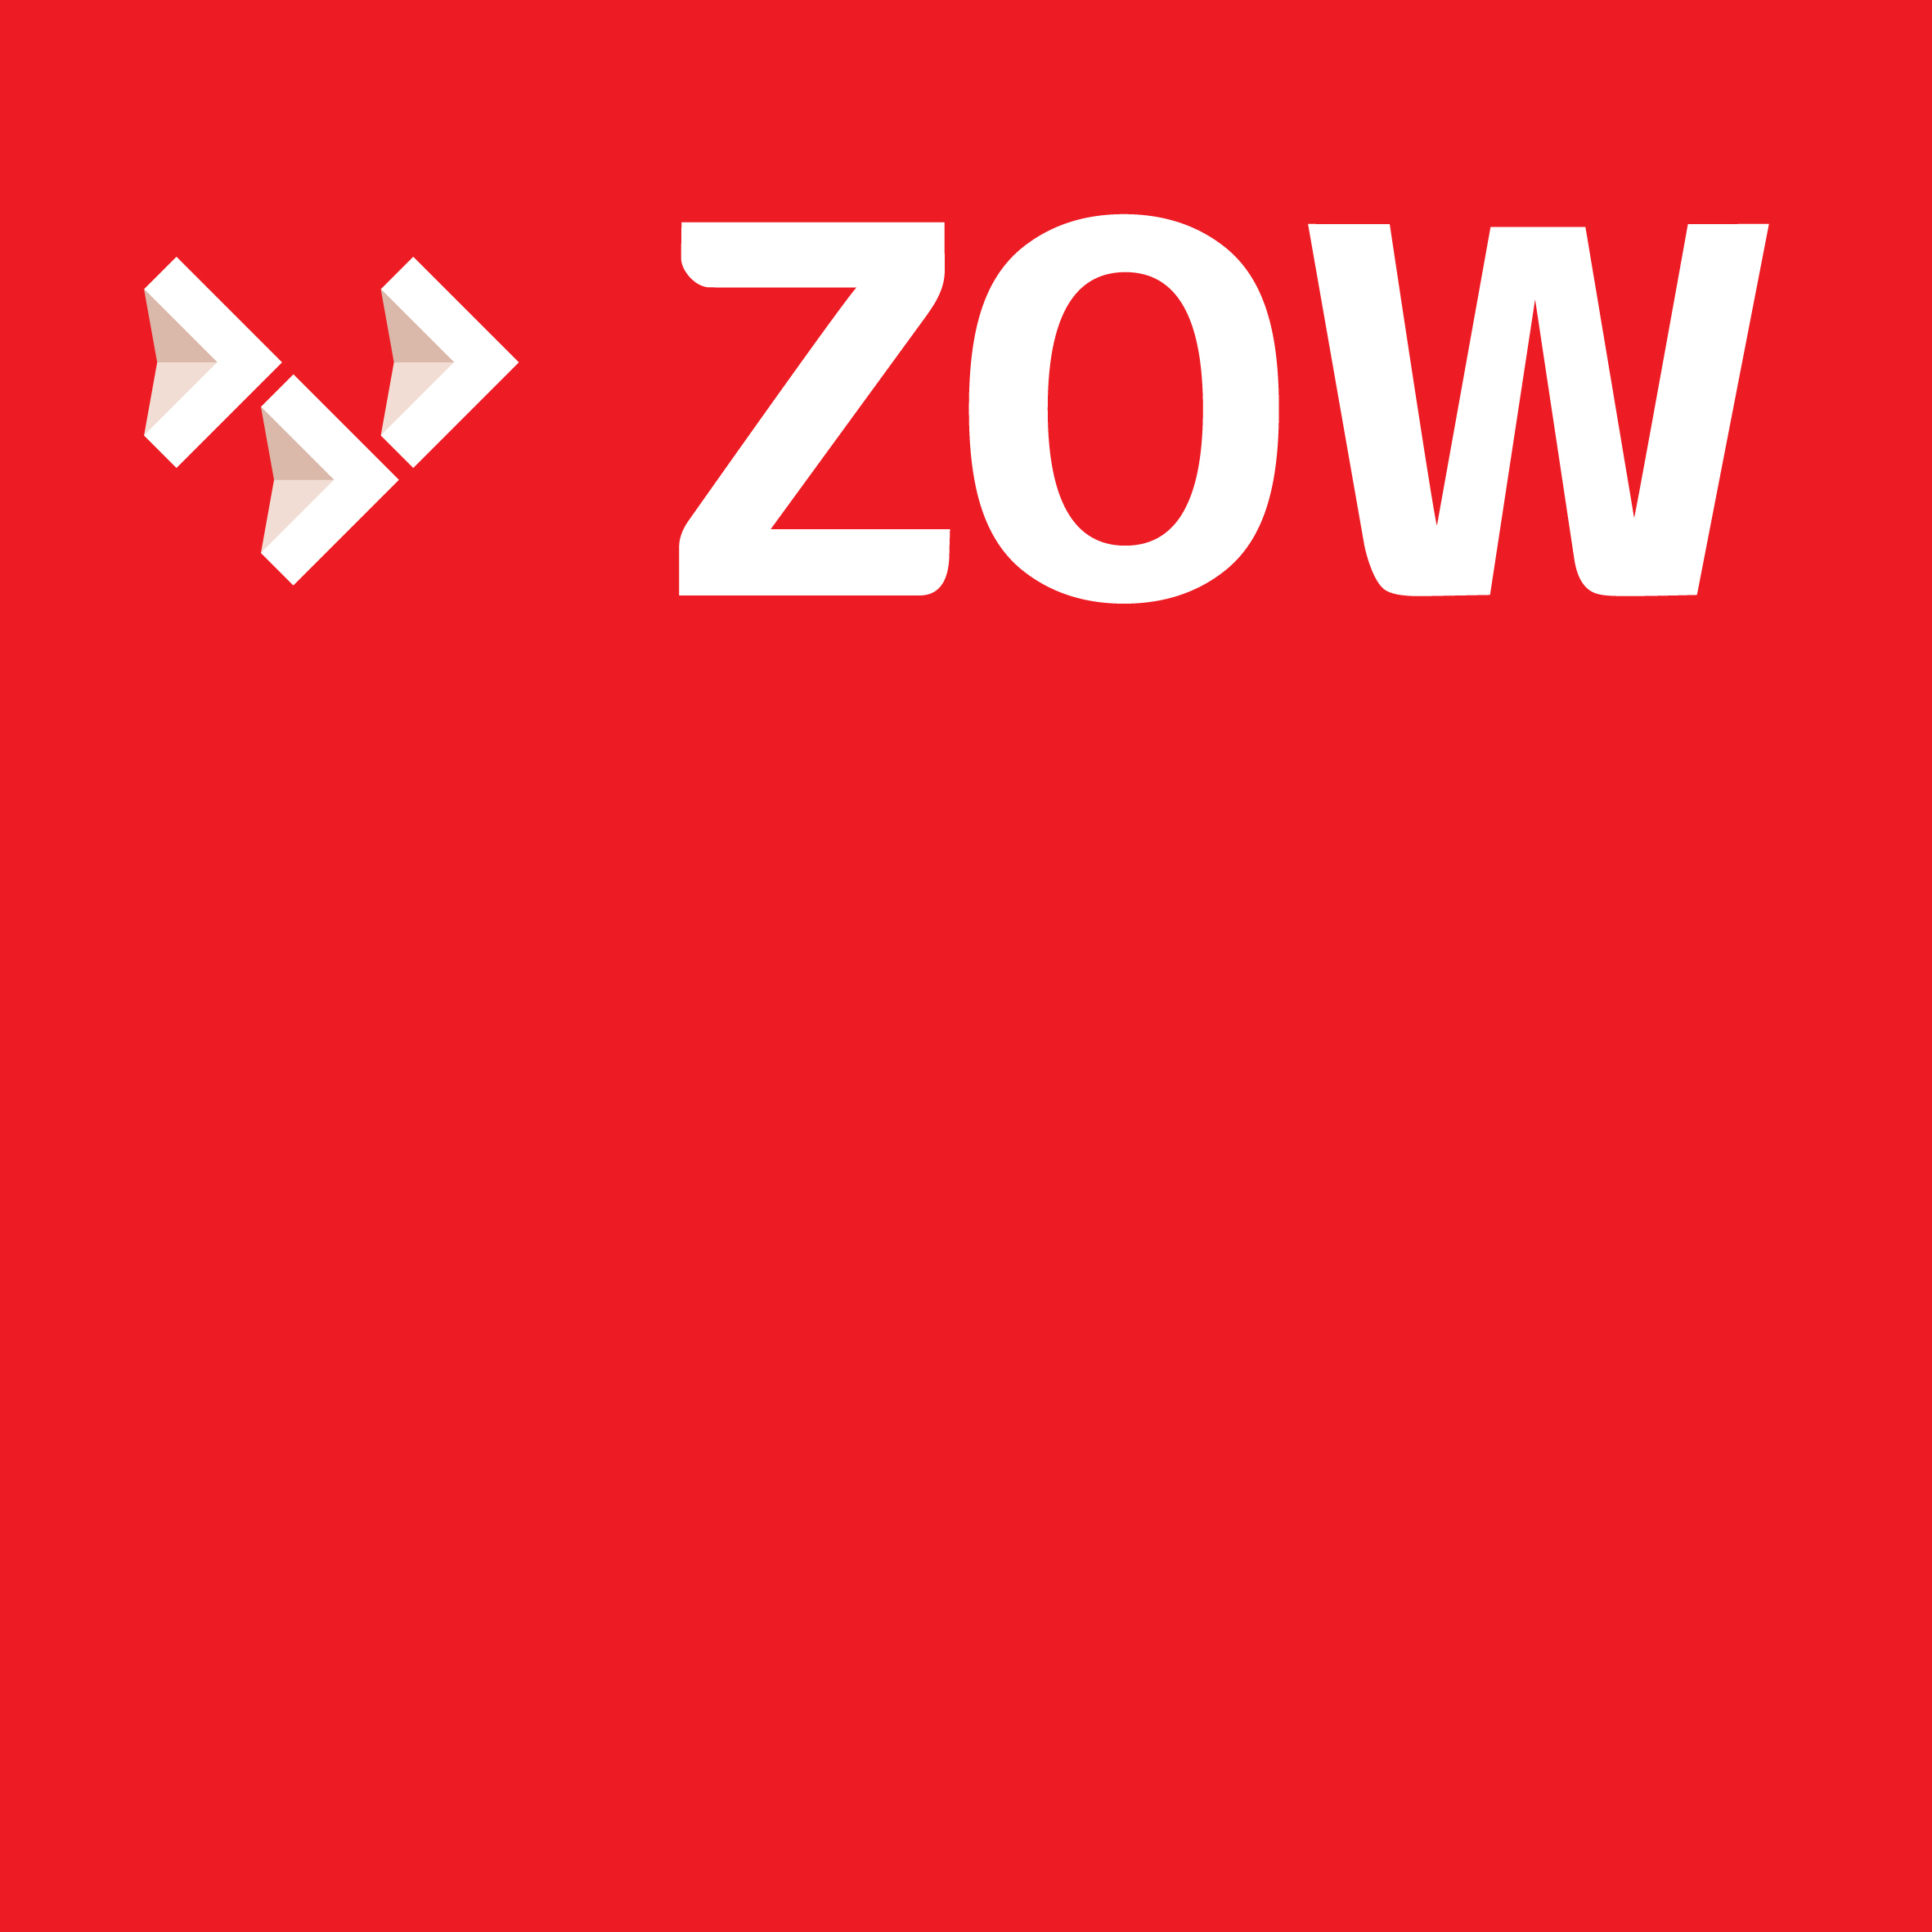 1000_ZOW_Logo_4c.jpg